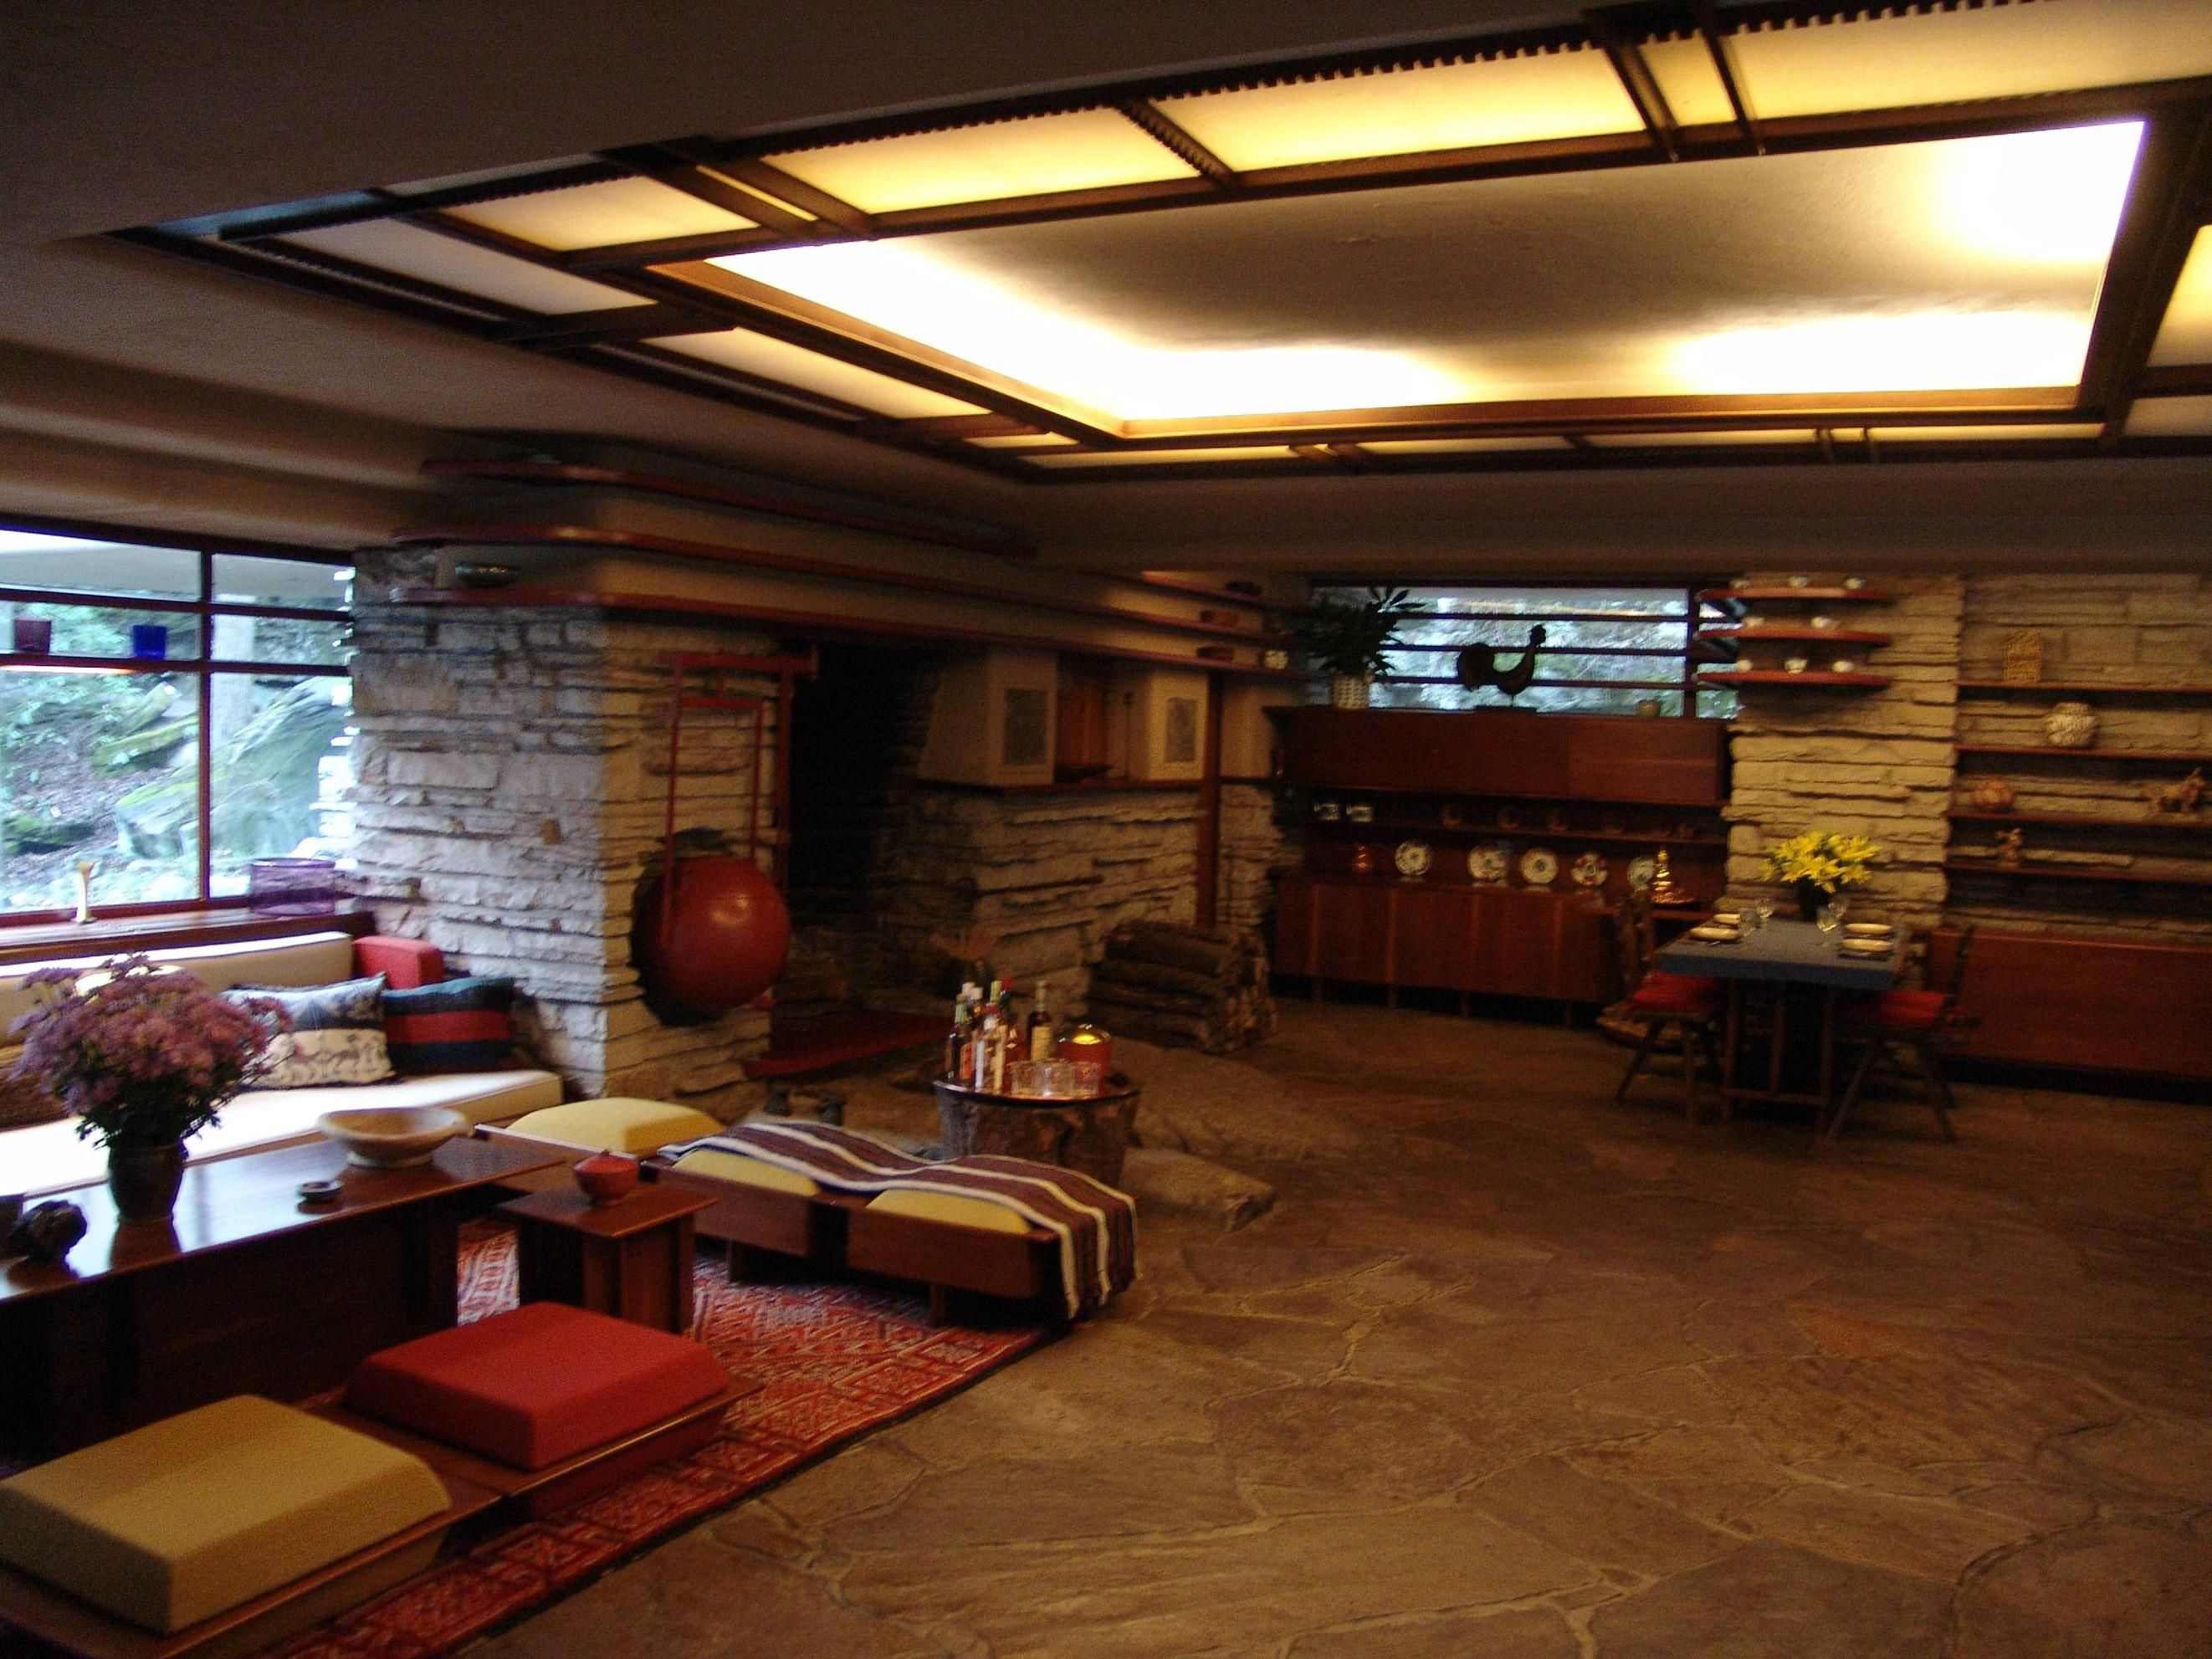 Frank Lloyd Wright Interior Design Fallingwater Interior Hearth  Google Search  Arts & Crafts Style